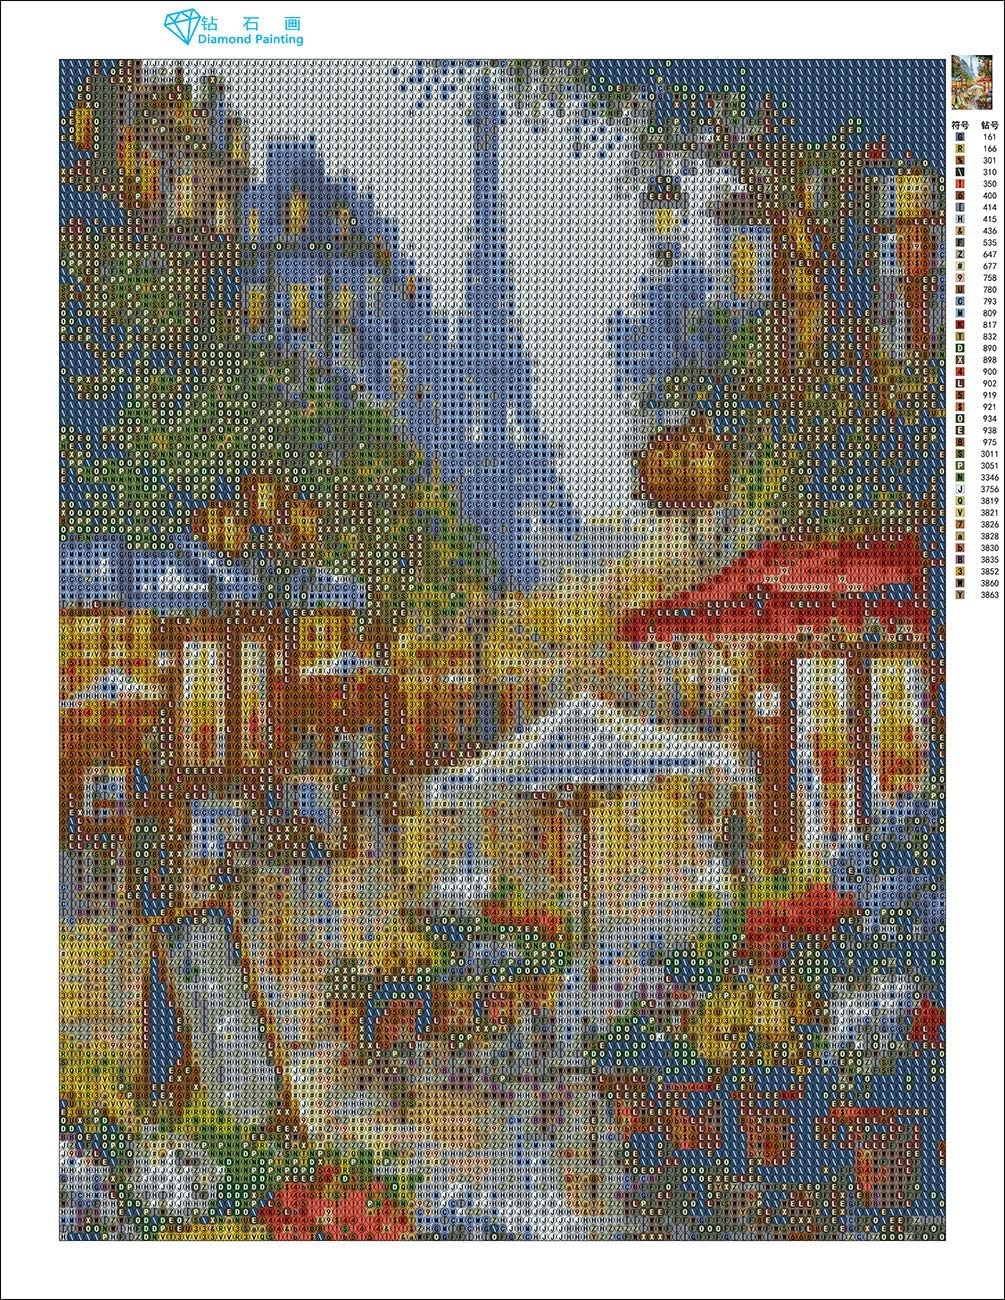 Zimal New!3D DIY Full Diamond Painting Embroidery Street of Paris Rhinestone Picture Diamond Swan Love Gift Craft 30x40cm